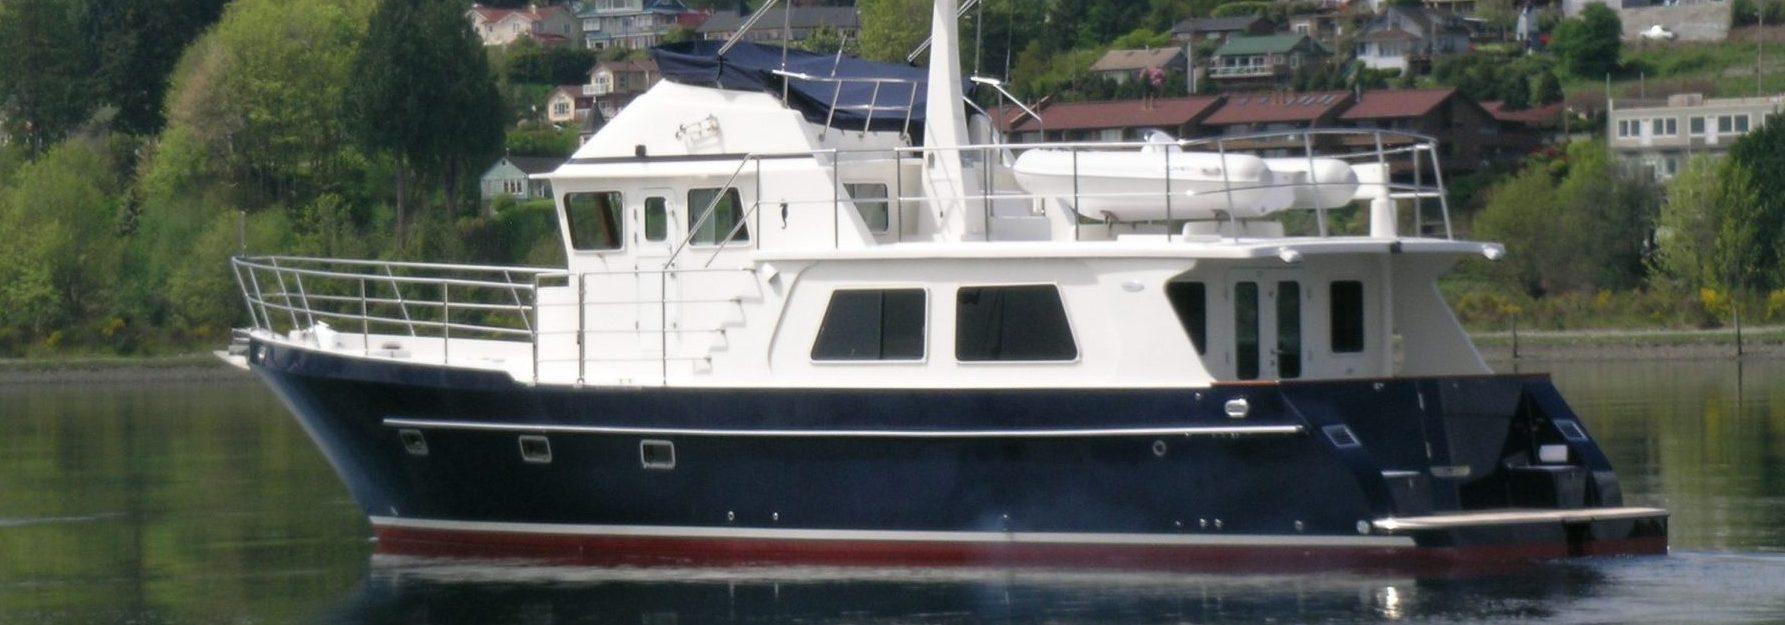 Seahorse Trawler port side